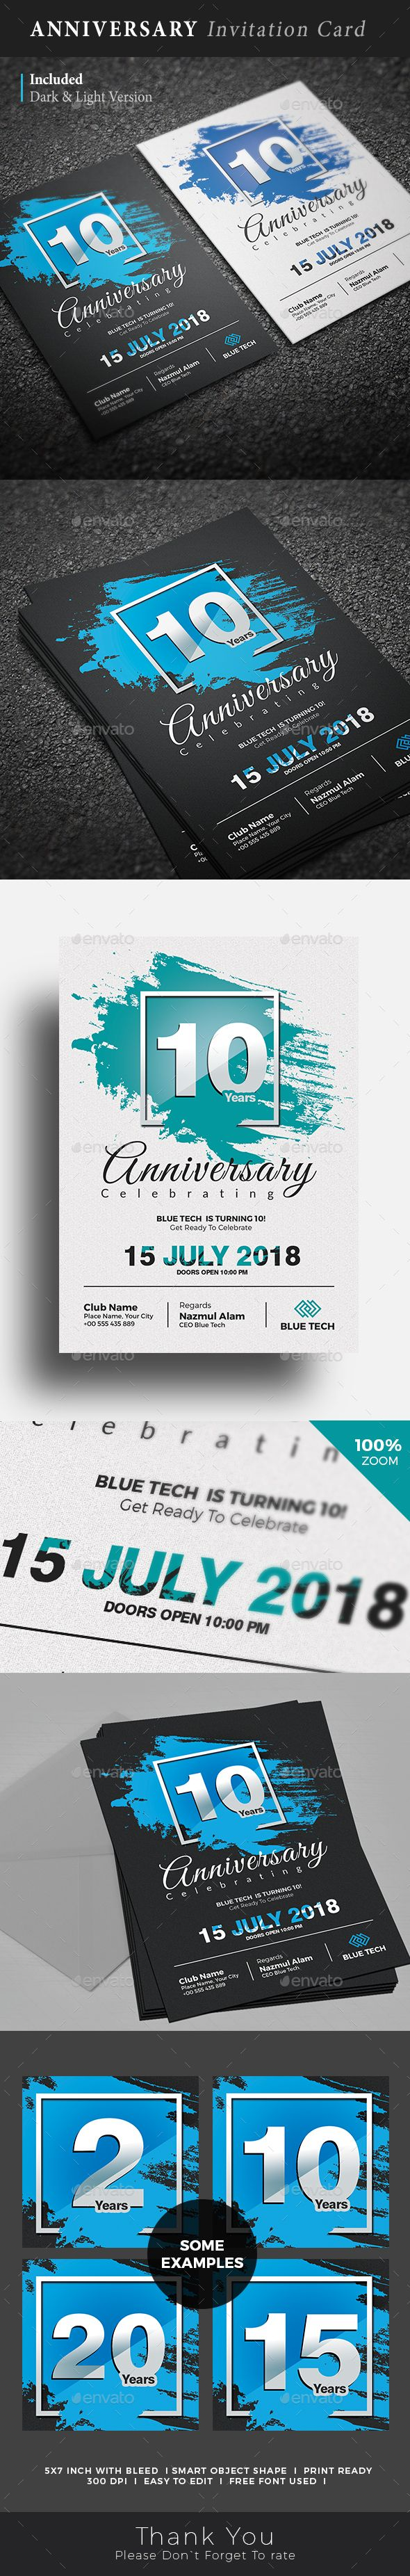 Anniversary Invitation Card Template PSD. Download here: https://graphicriver.net/item/anniversary-invitation-card/17365294?ref=ksioks